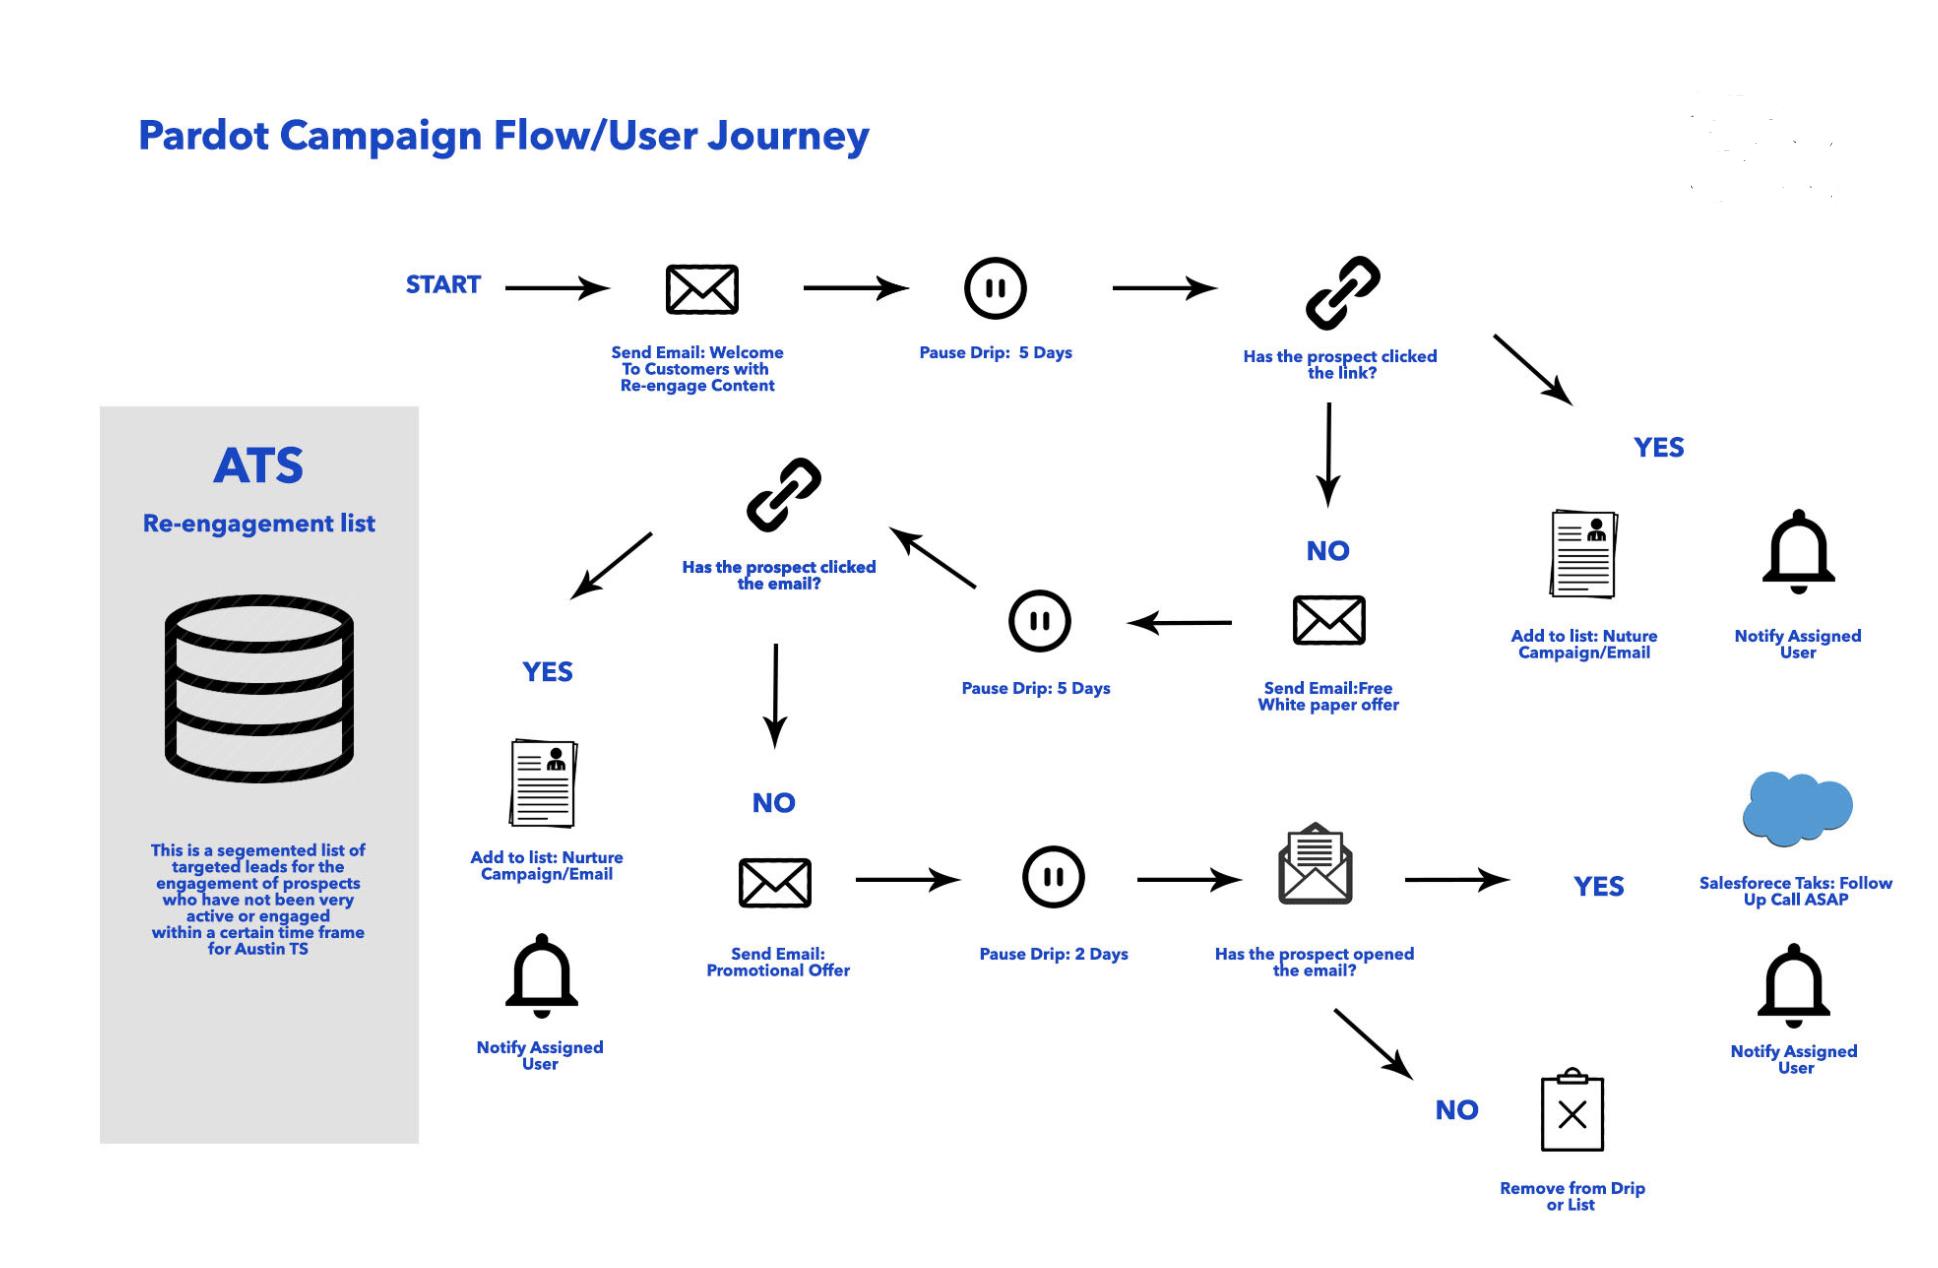 Pardot Workflow Design - ATS